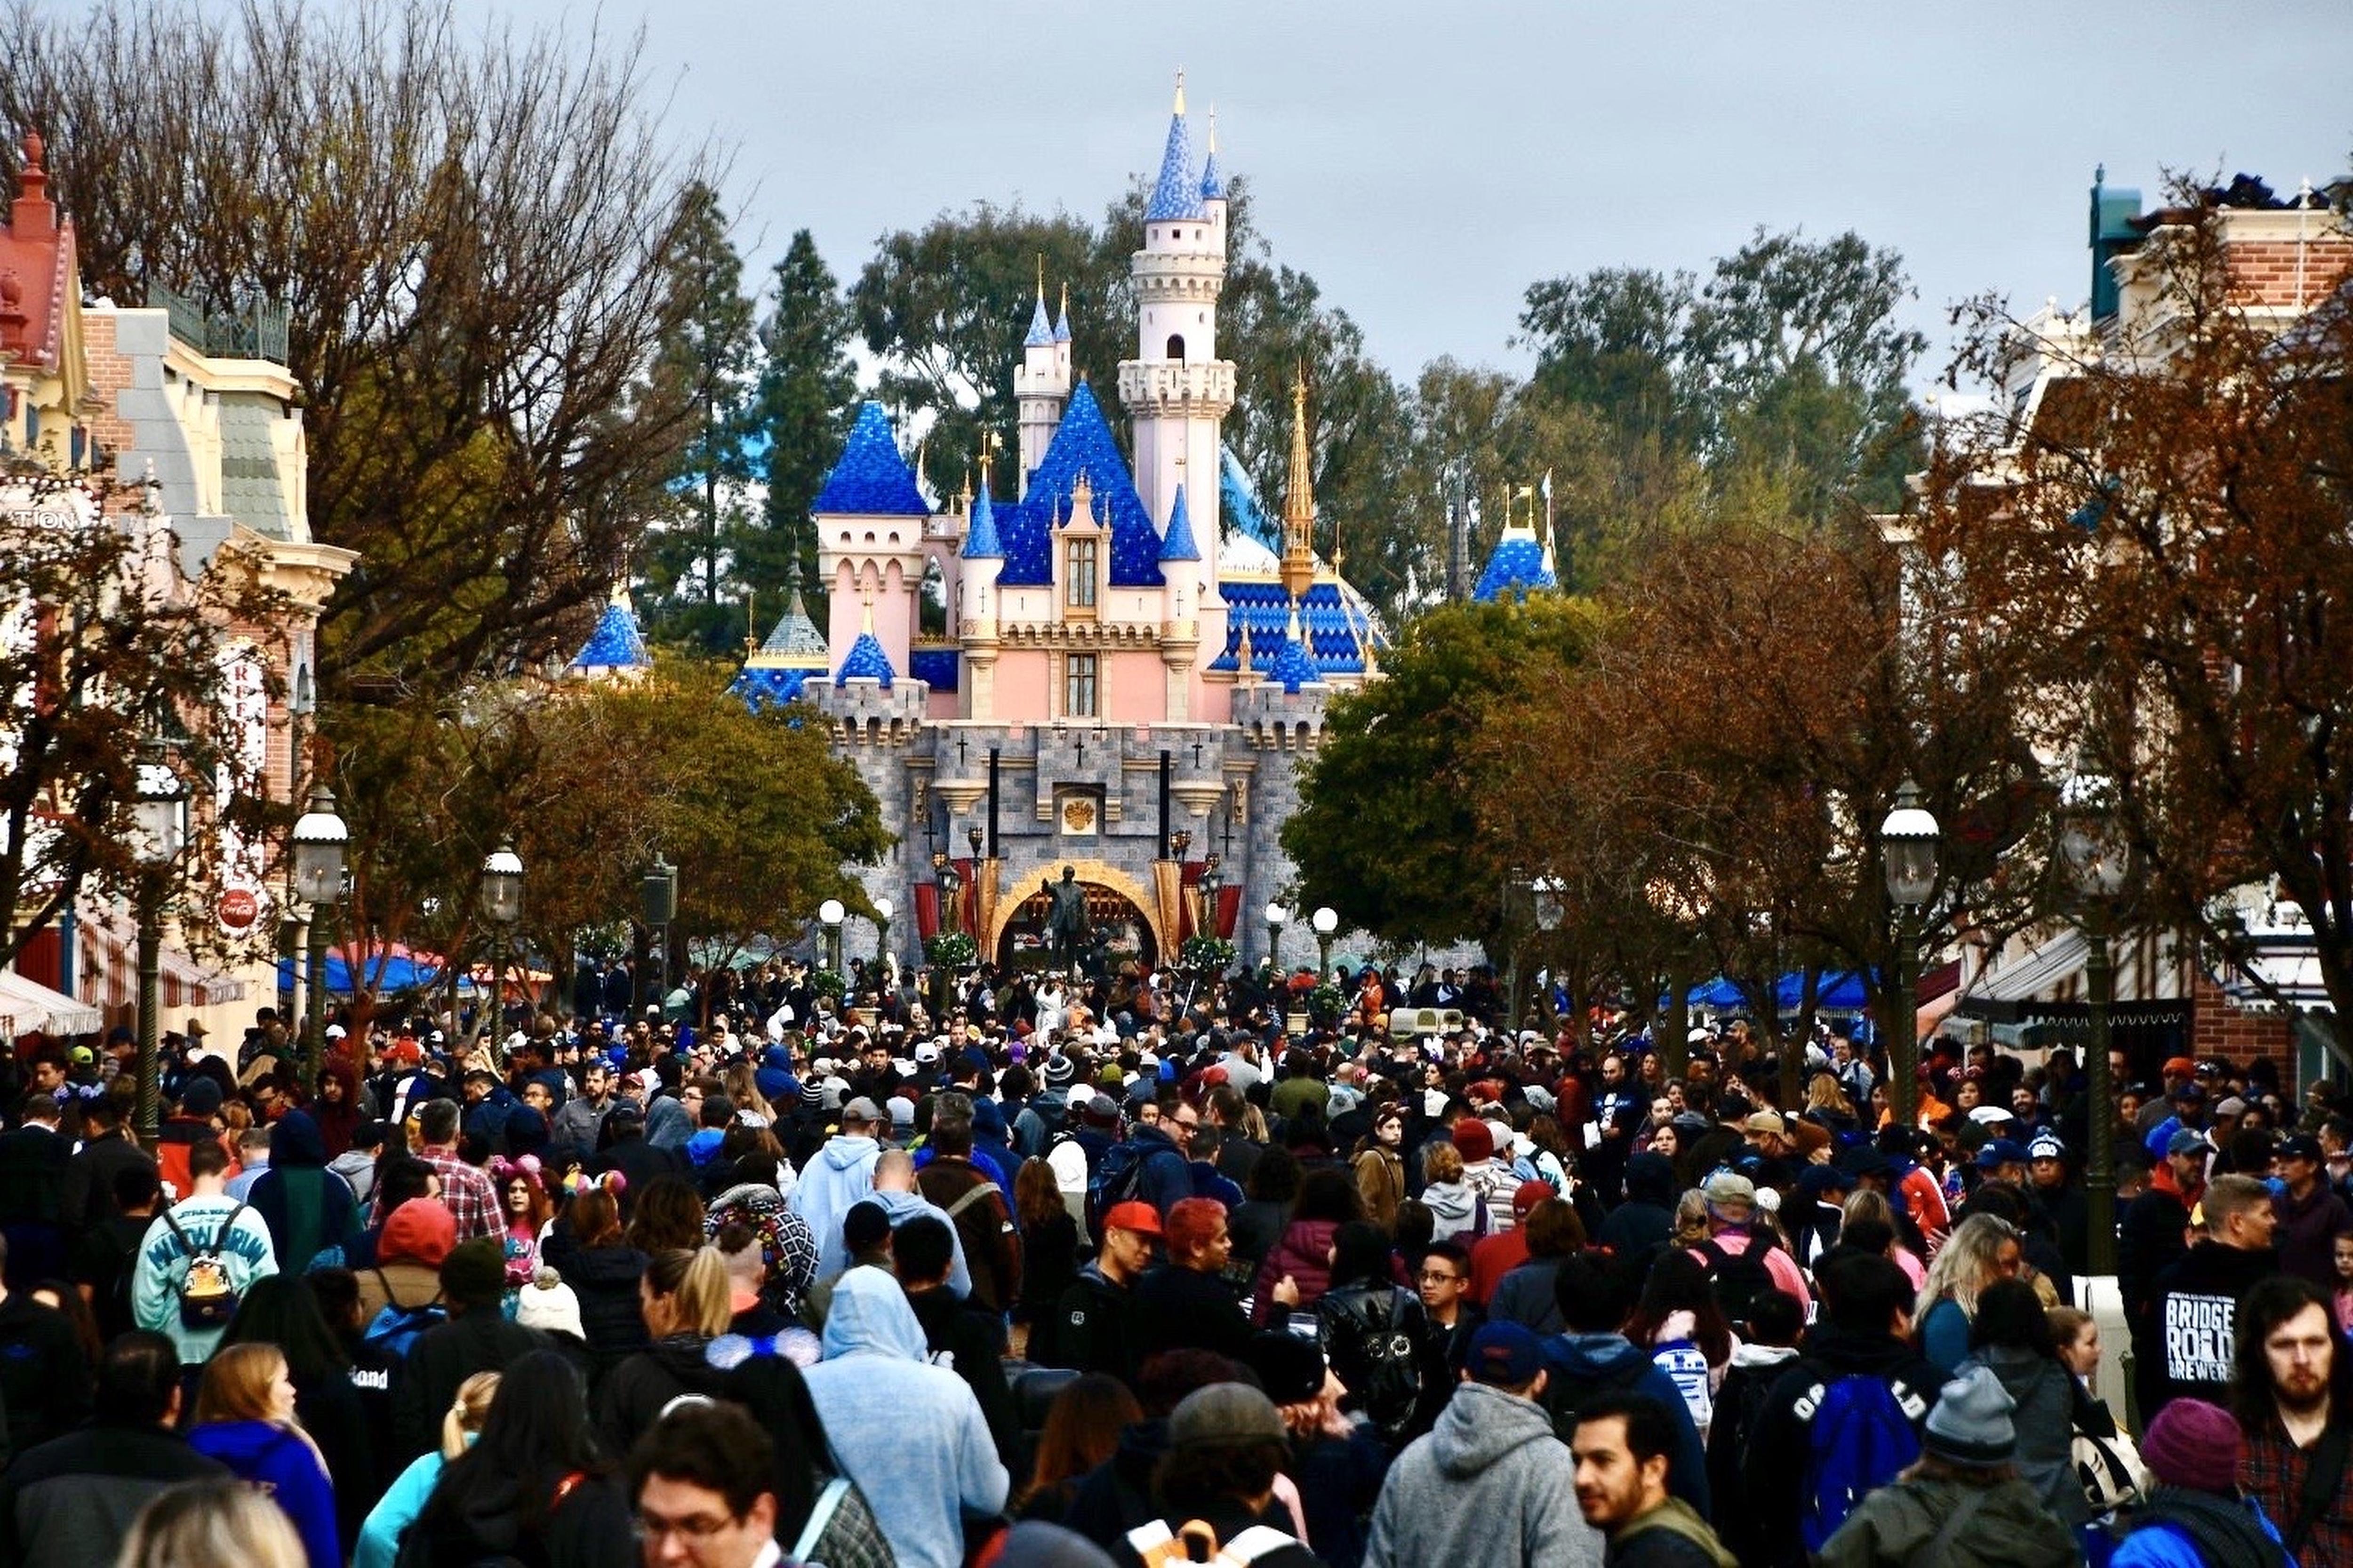 Disney World and Disneyland are closing amid Covid-19 fears